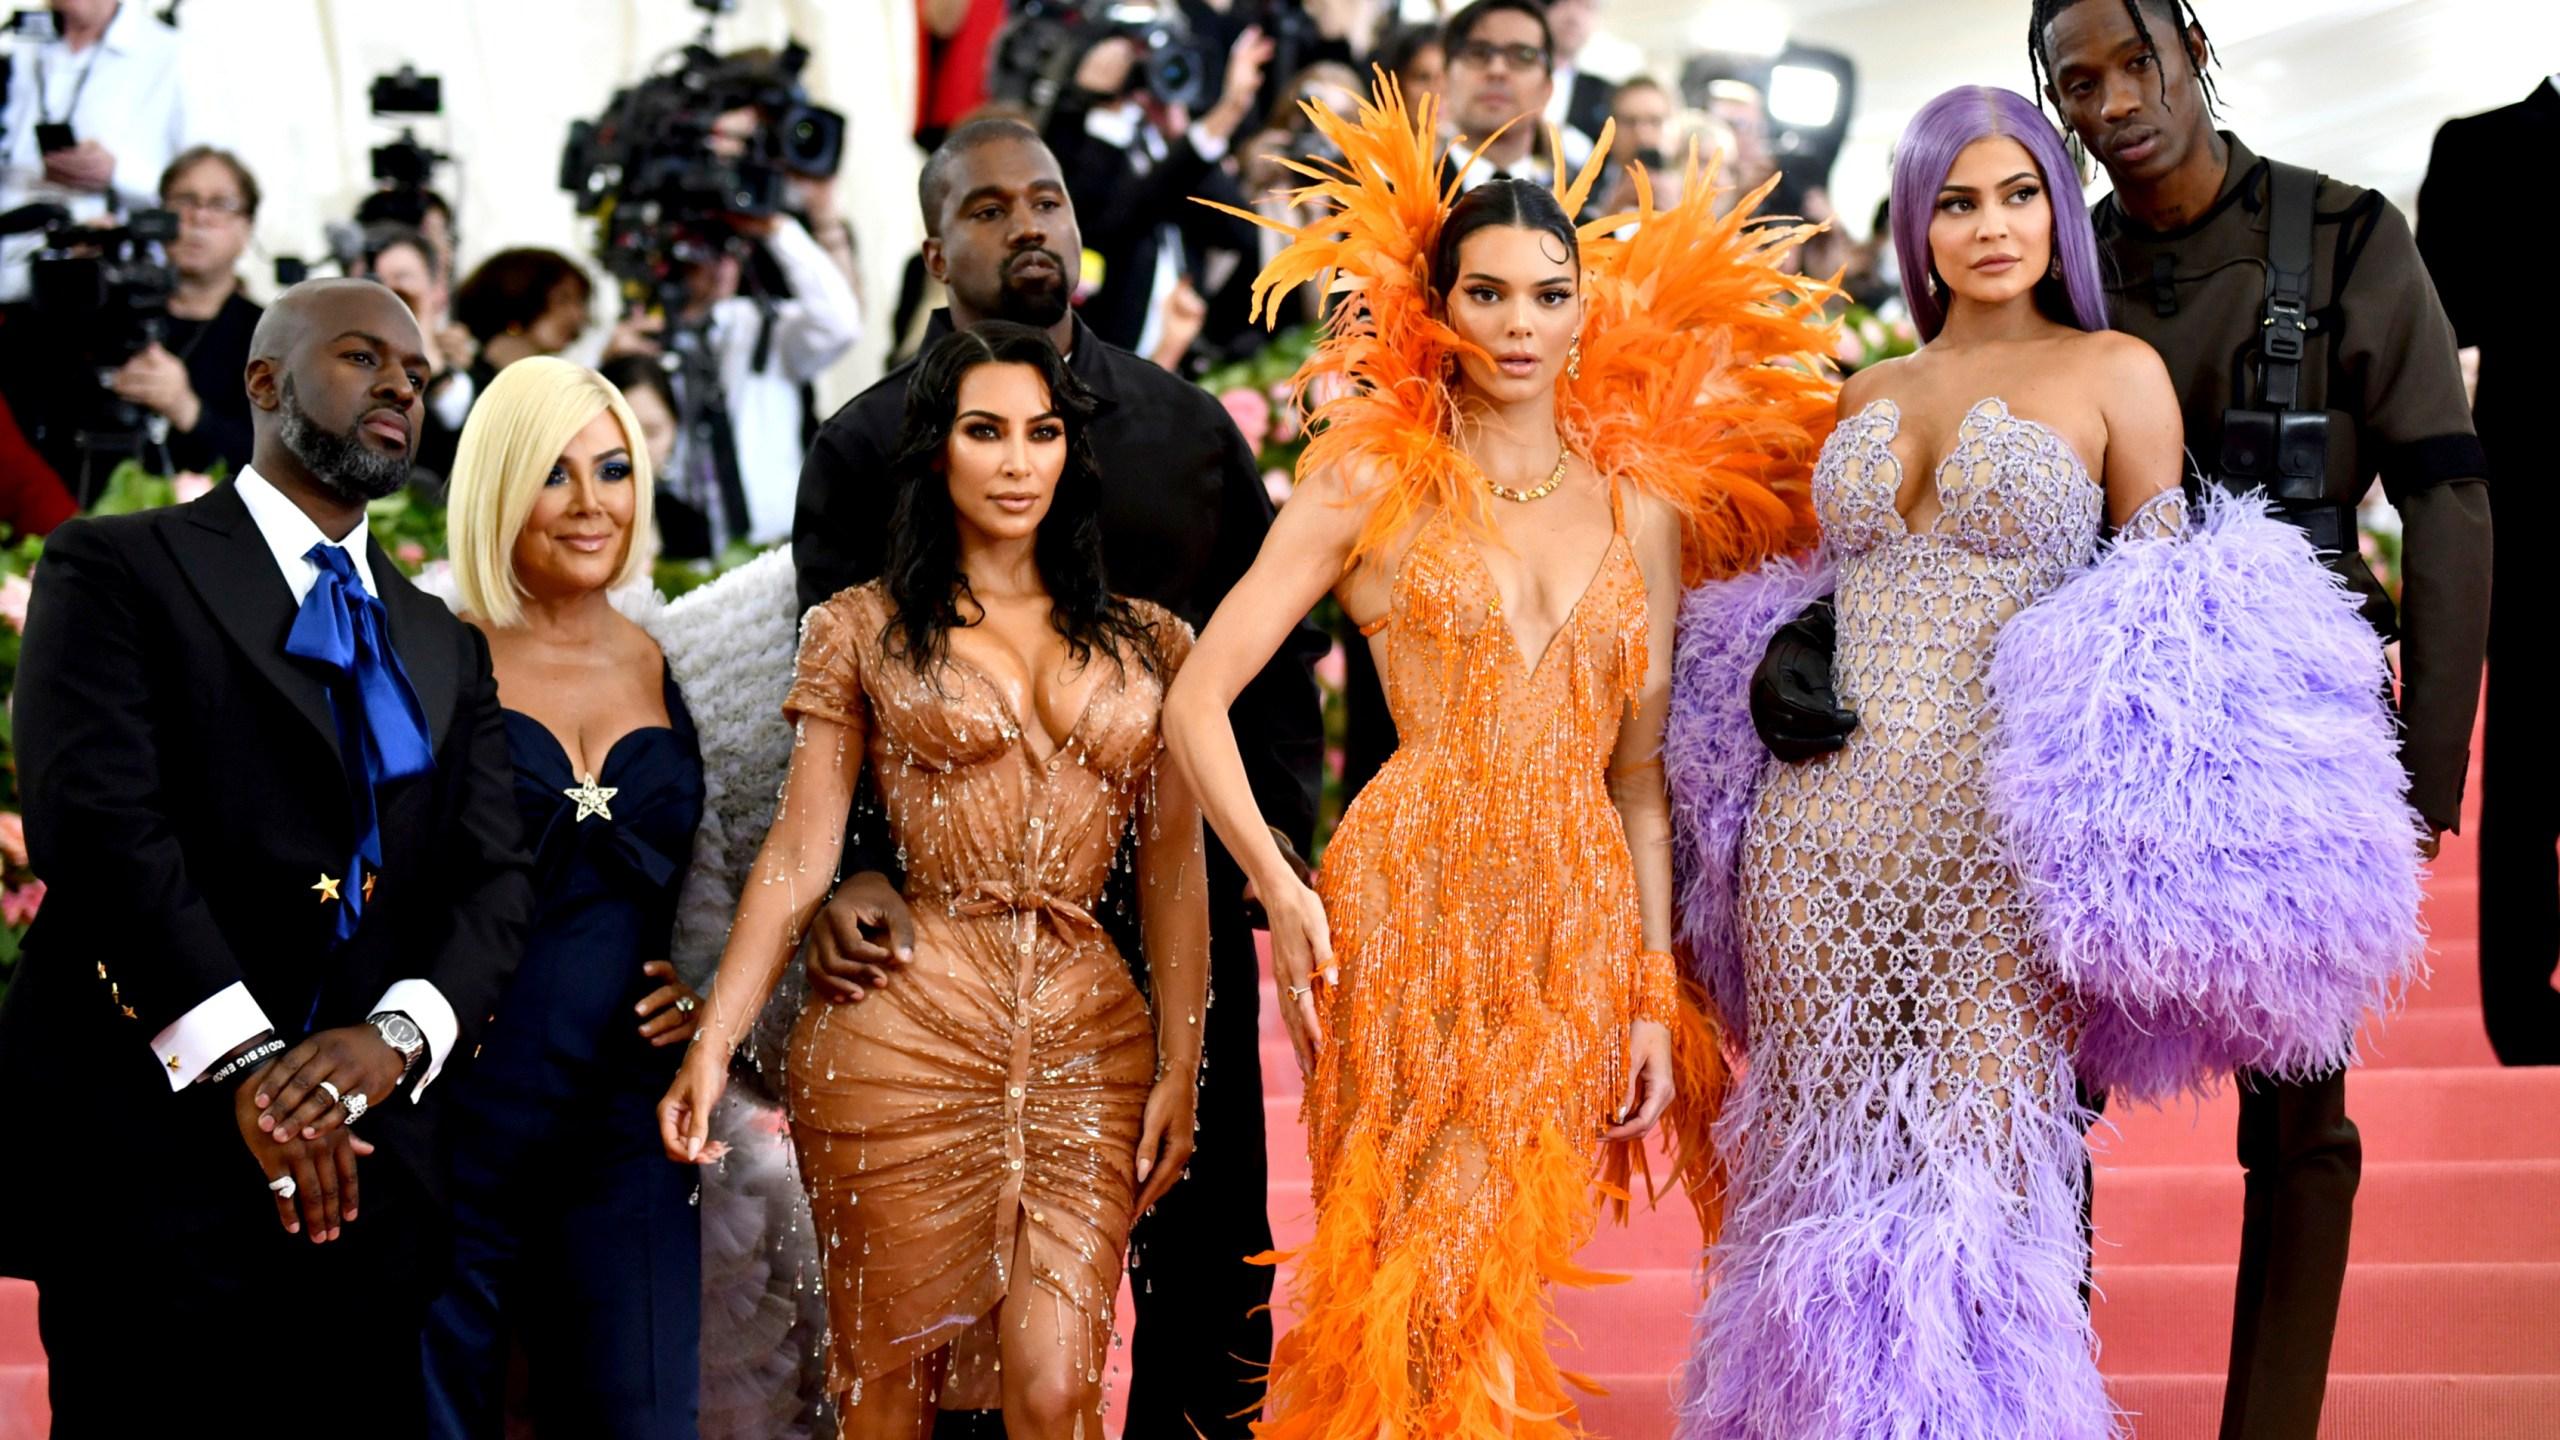 Corey Gamble, Kris Jenner, Kim Kardashian, Kendall Jenner, Kylie Jenner, Travis Scott